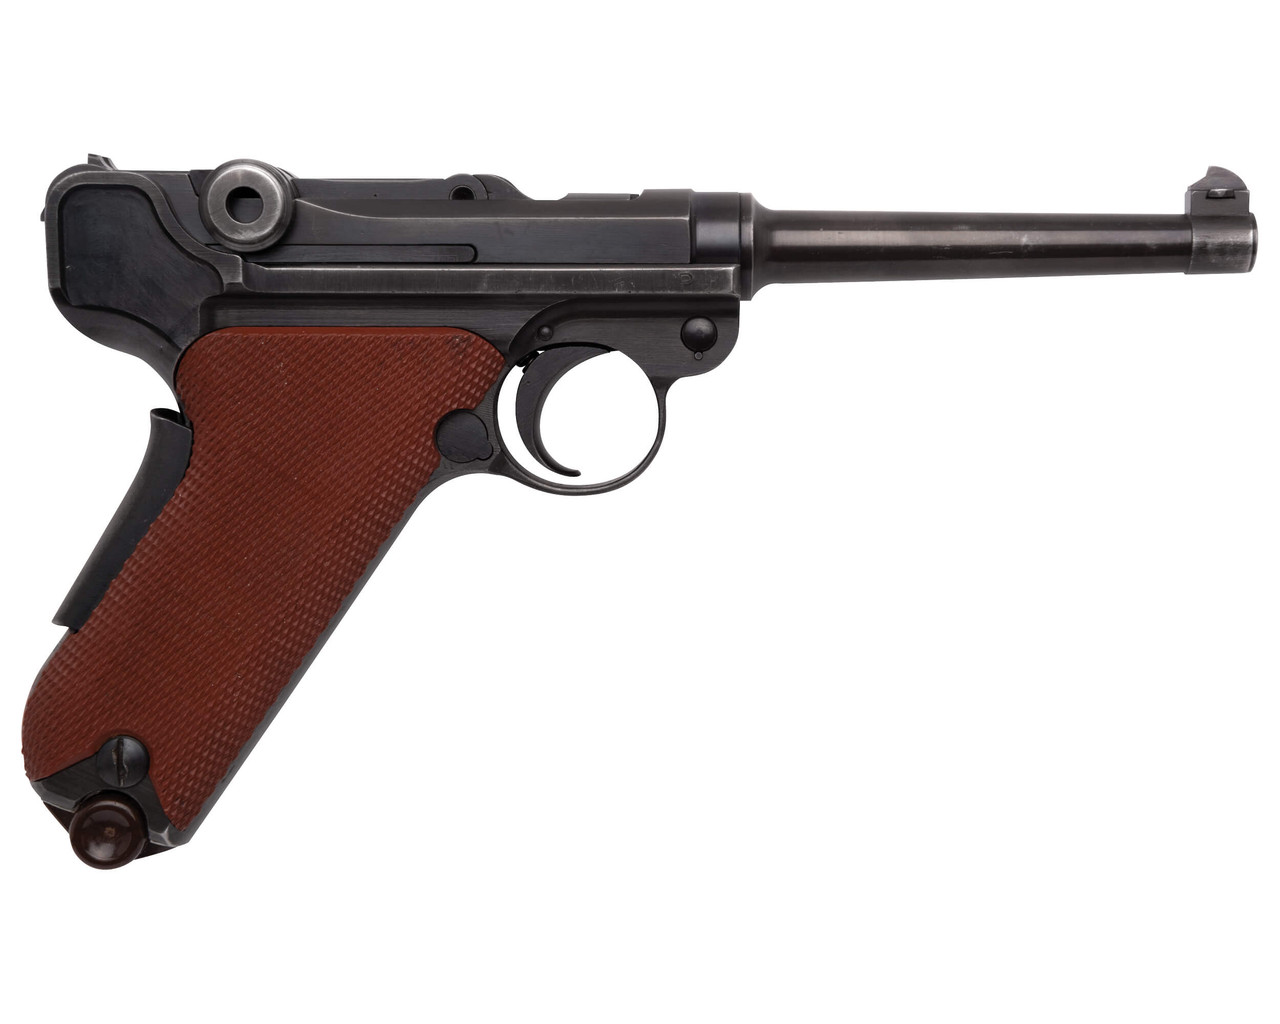 W+F Bern Swiss 06/29 Luger - Red Grips - sn 51xxx